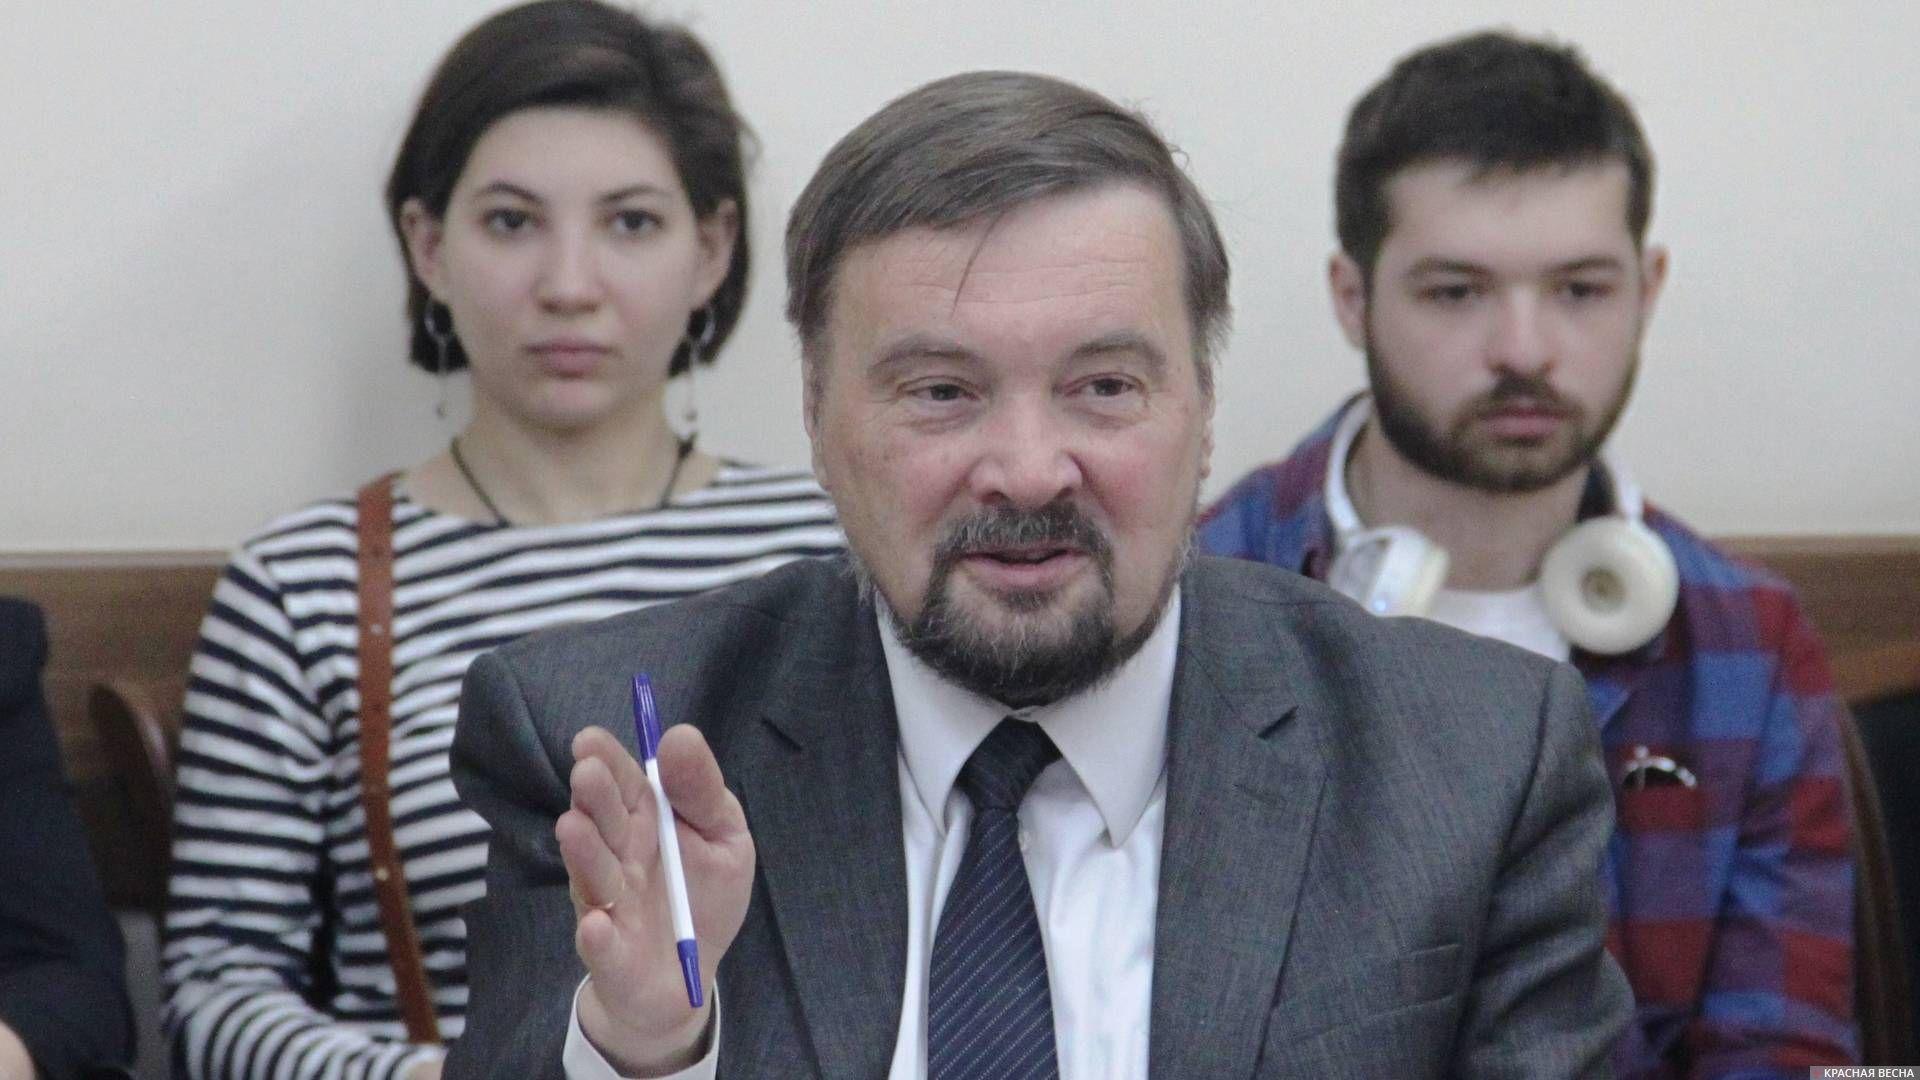 Заслуженный архитектор Кубани, бывший главный архитектор Краснодара Александр Кузнецов